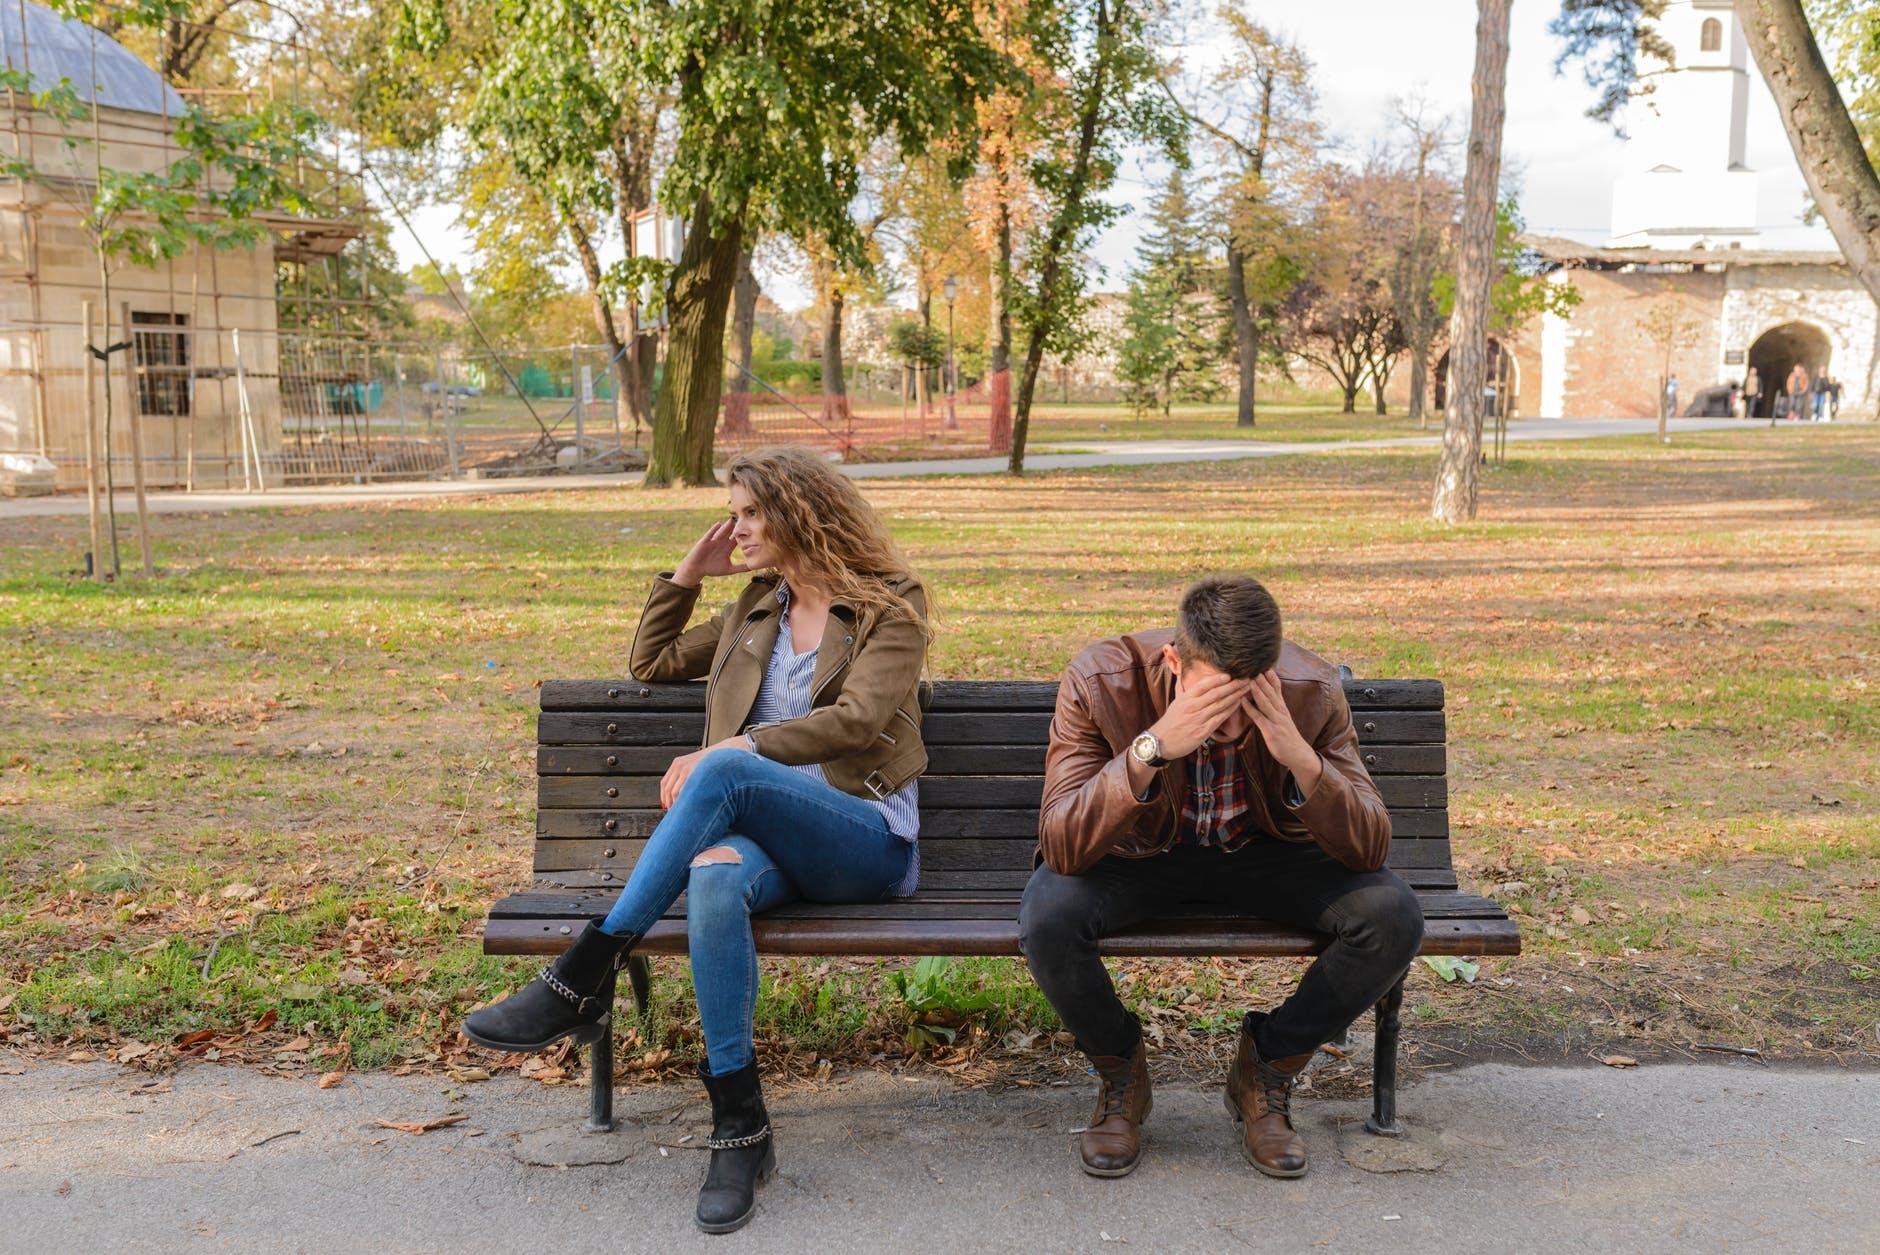 odnos problem svađa adolescent veza